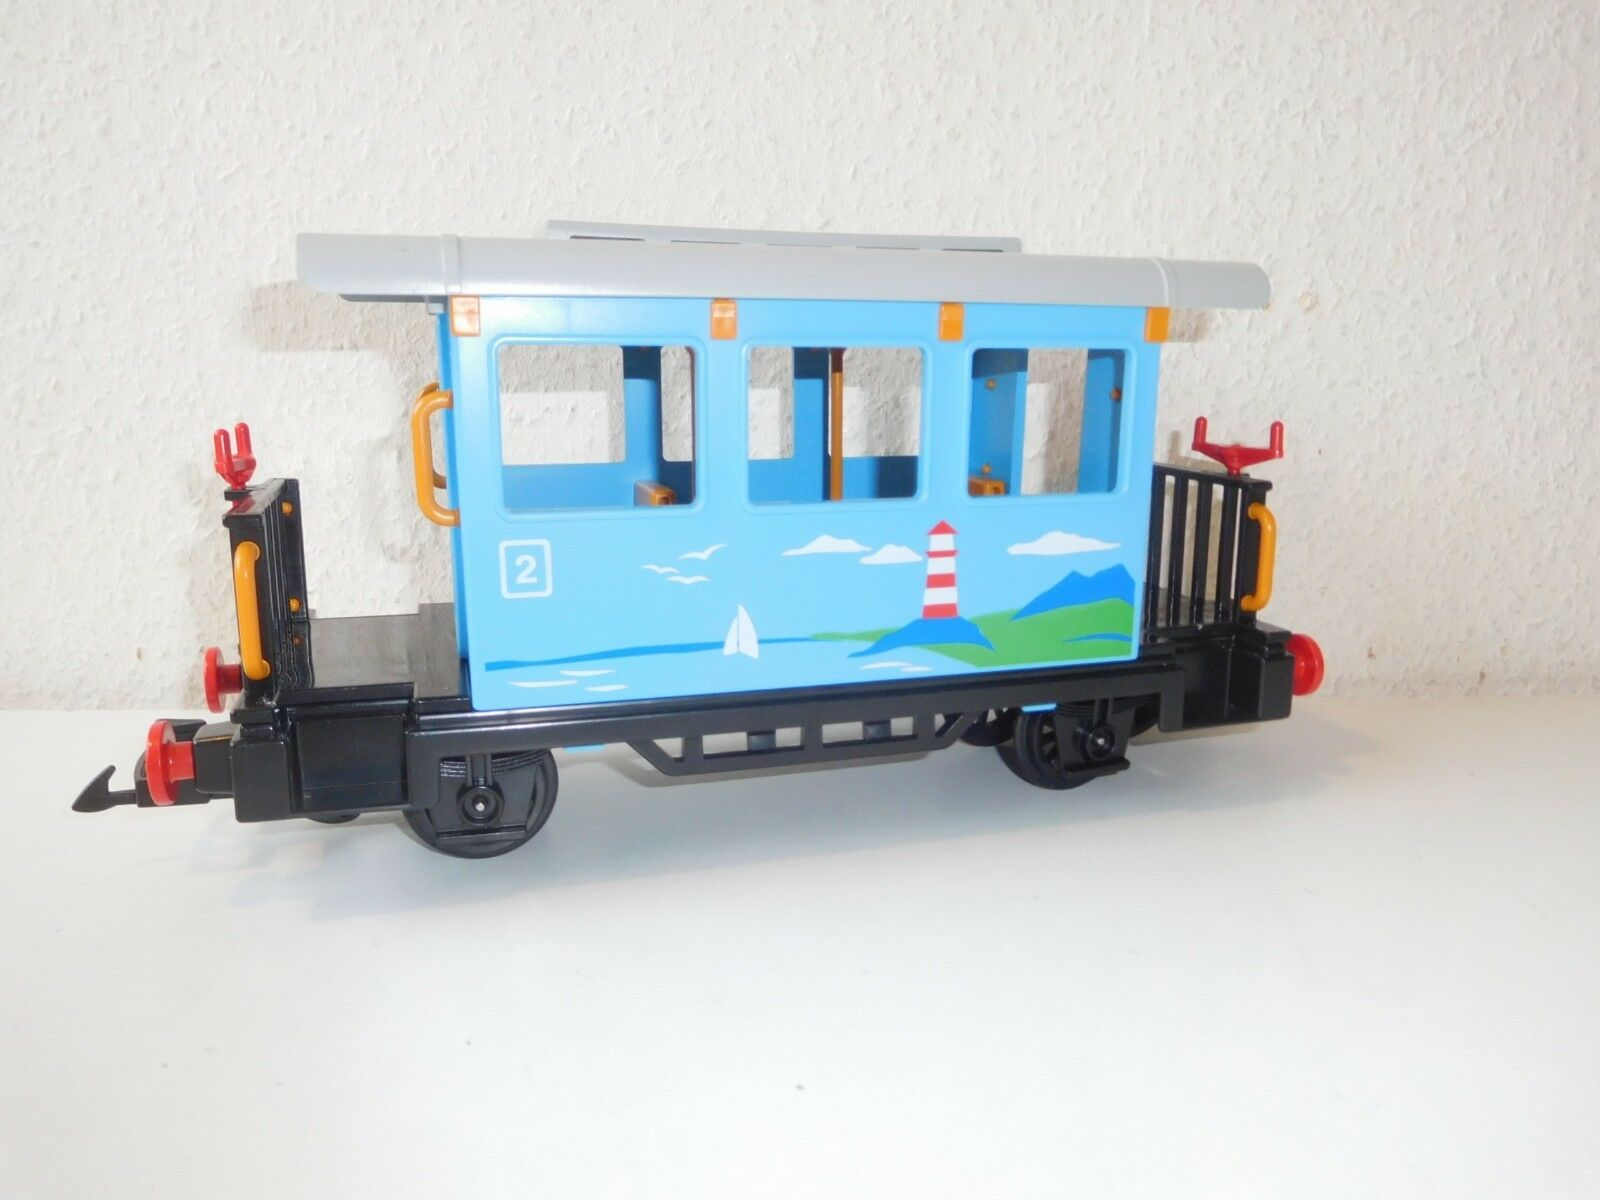 Playmobil train traincar traincar traincar LGB 4005 a828ce